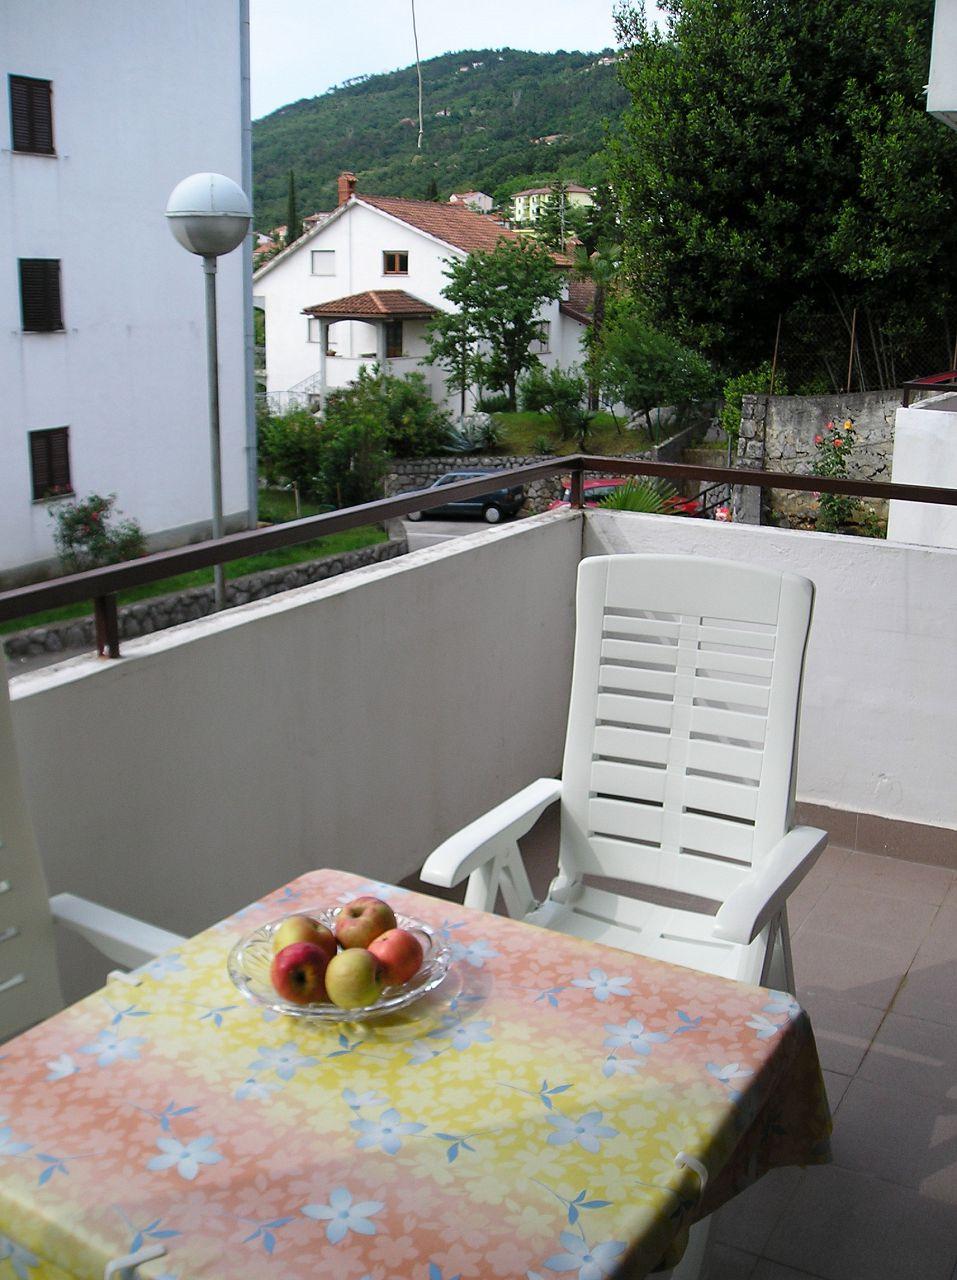 5751 - Lovran - Apartments Croatia - A1(2+2): terrace